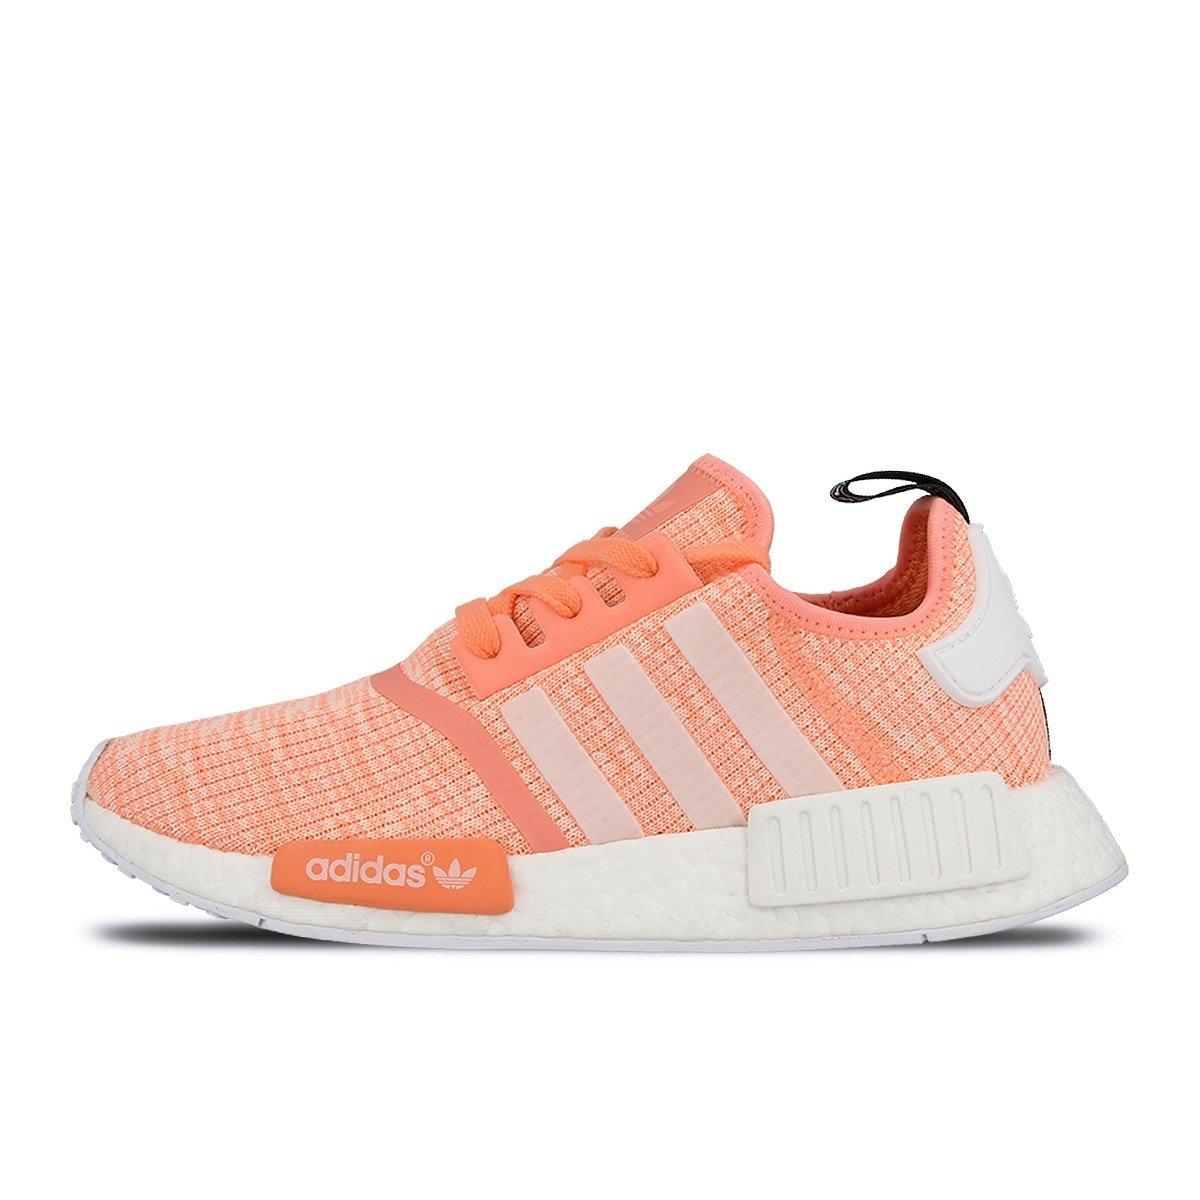 b6eadb4d2 ... Best Wholesaler Adidas NMD R1 W Glitch Sun Glow Coral Pink Haze BY3034  US Womens Size ...